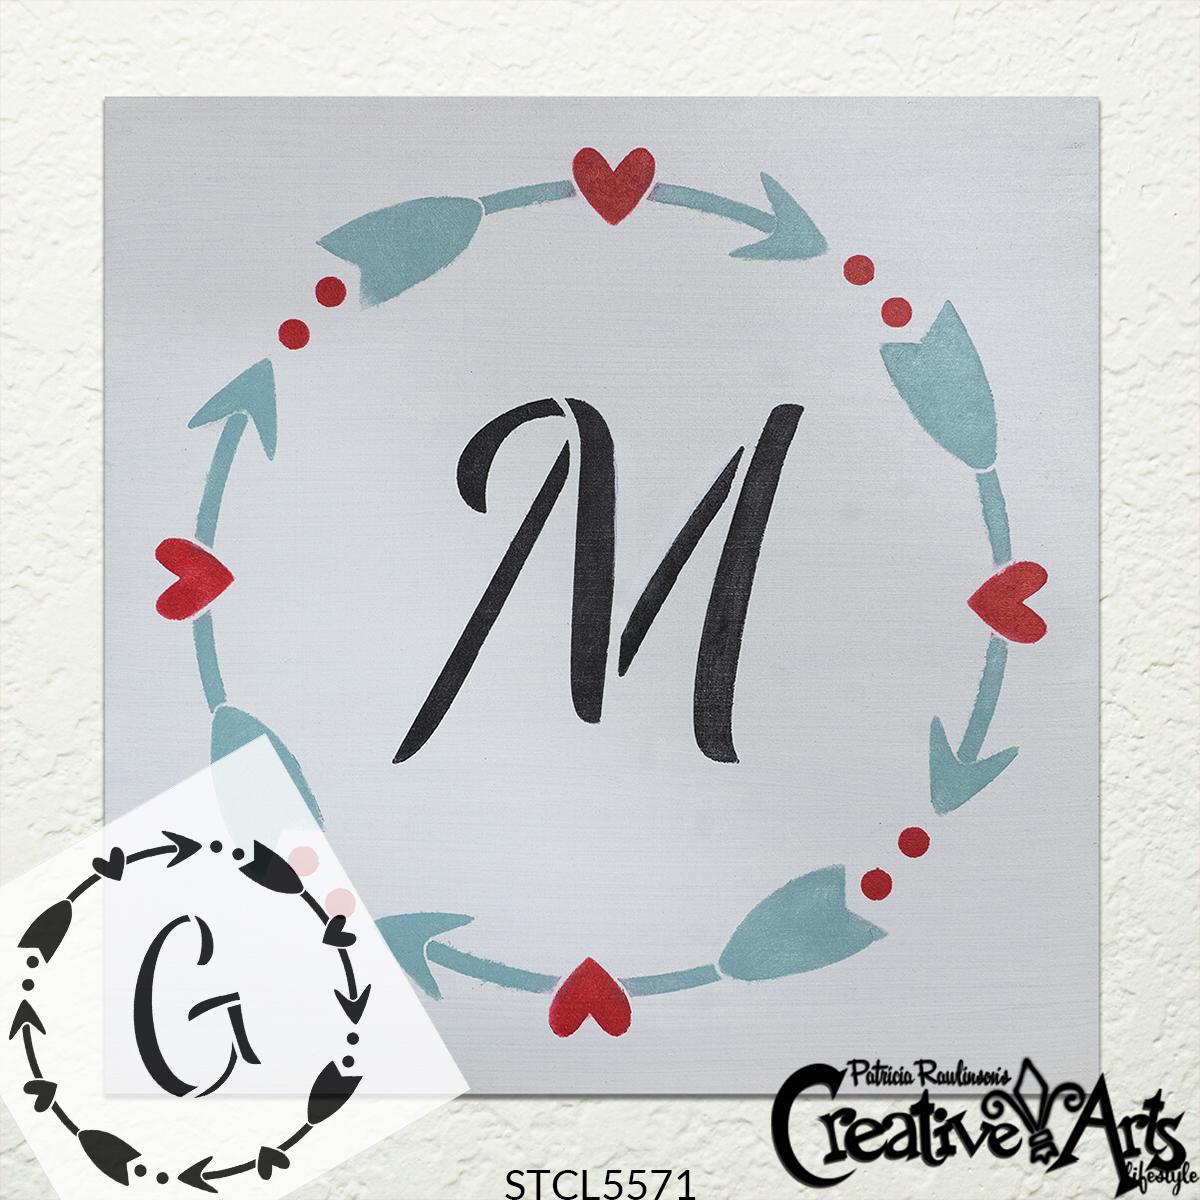 Heart & Arrow Wreath Monogram Stencil by StudioR12 | DIY Simple Valentine Farmhouse Home Decor | Craft & Paint Wood Sign | Select Size